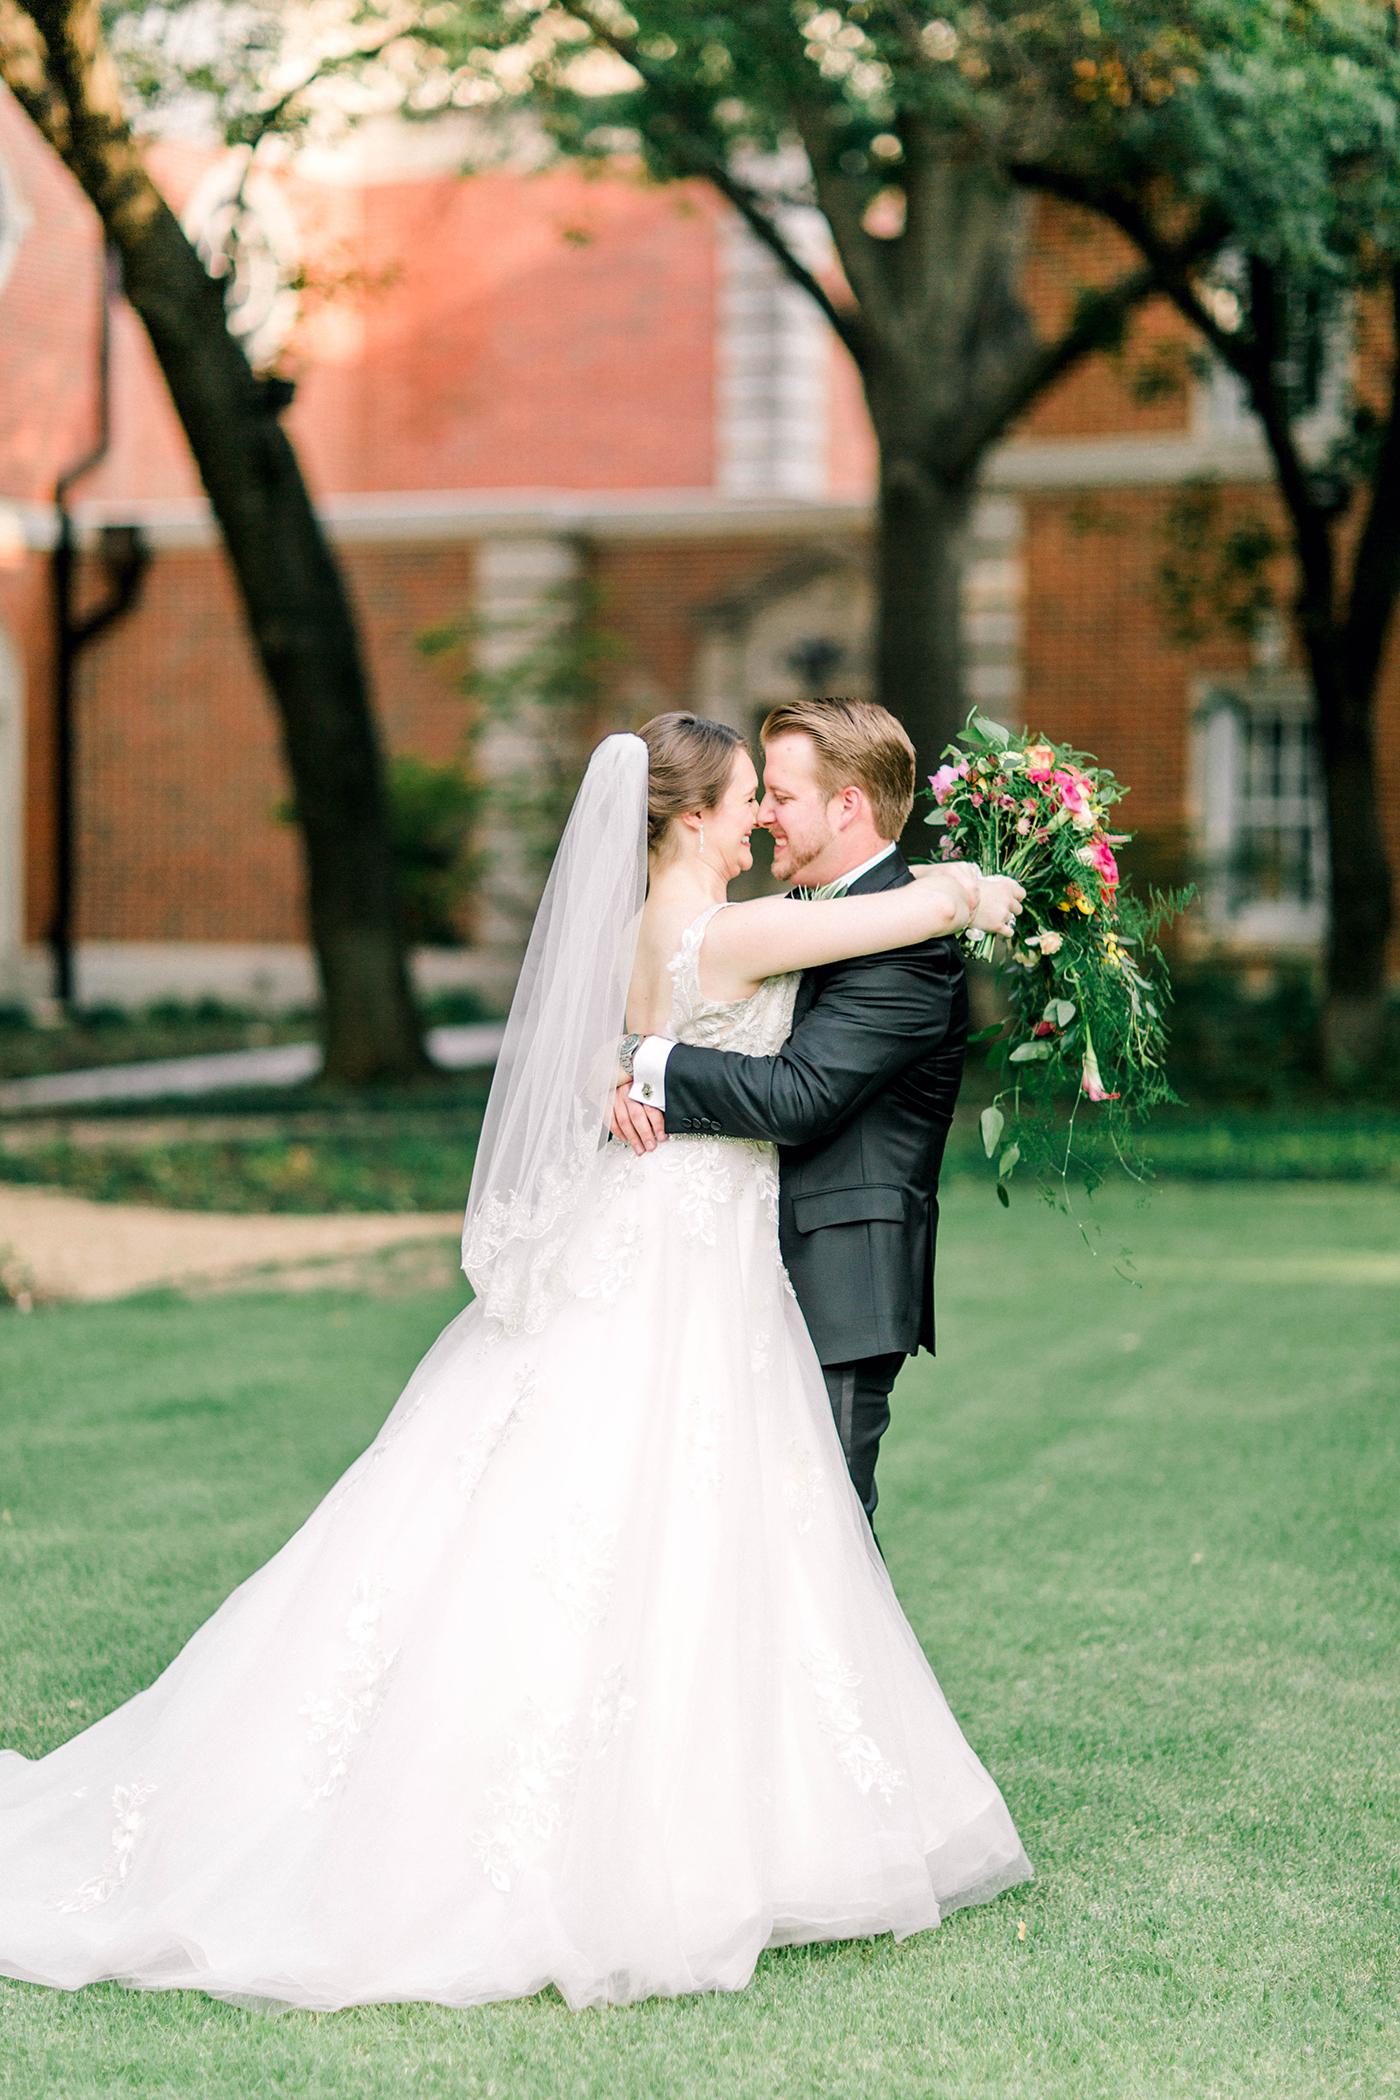 Dallas TX Wedding Planner - Allday Events - Hall on Dragon Wedding - 00016.jpg